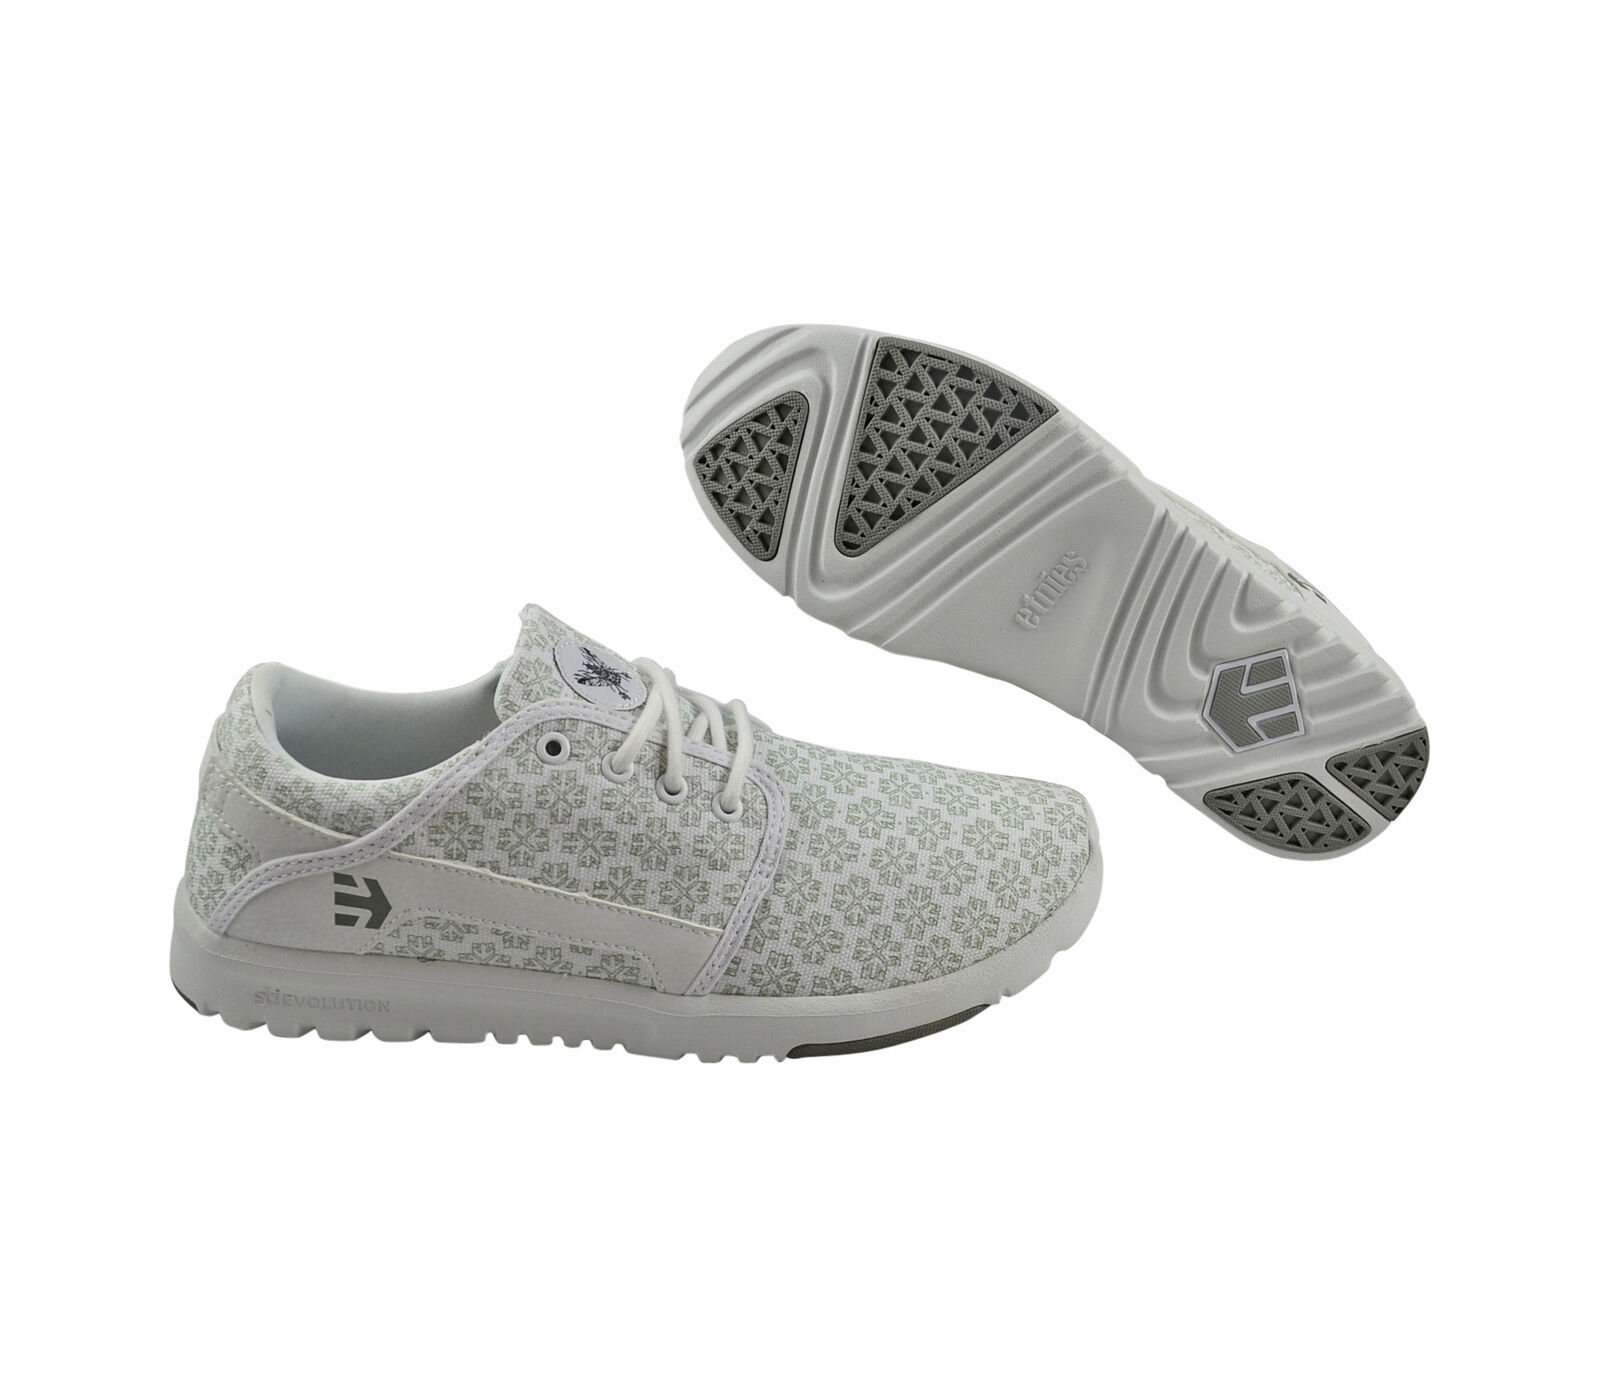 Etnies Scout X Skater- Nicomi Blanco Skater- X Zapatos/Sneaker weiß 82148a